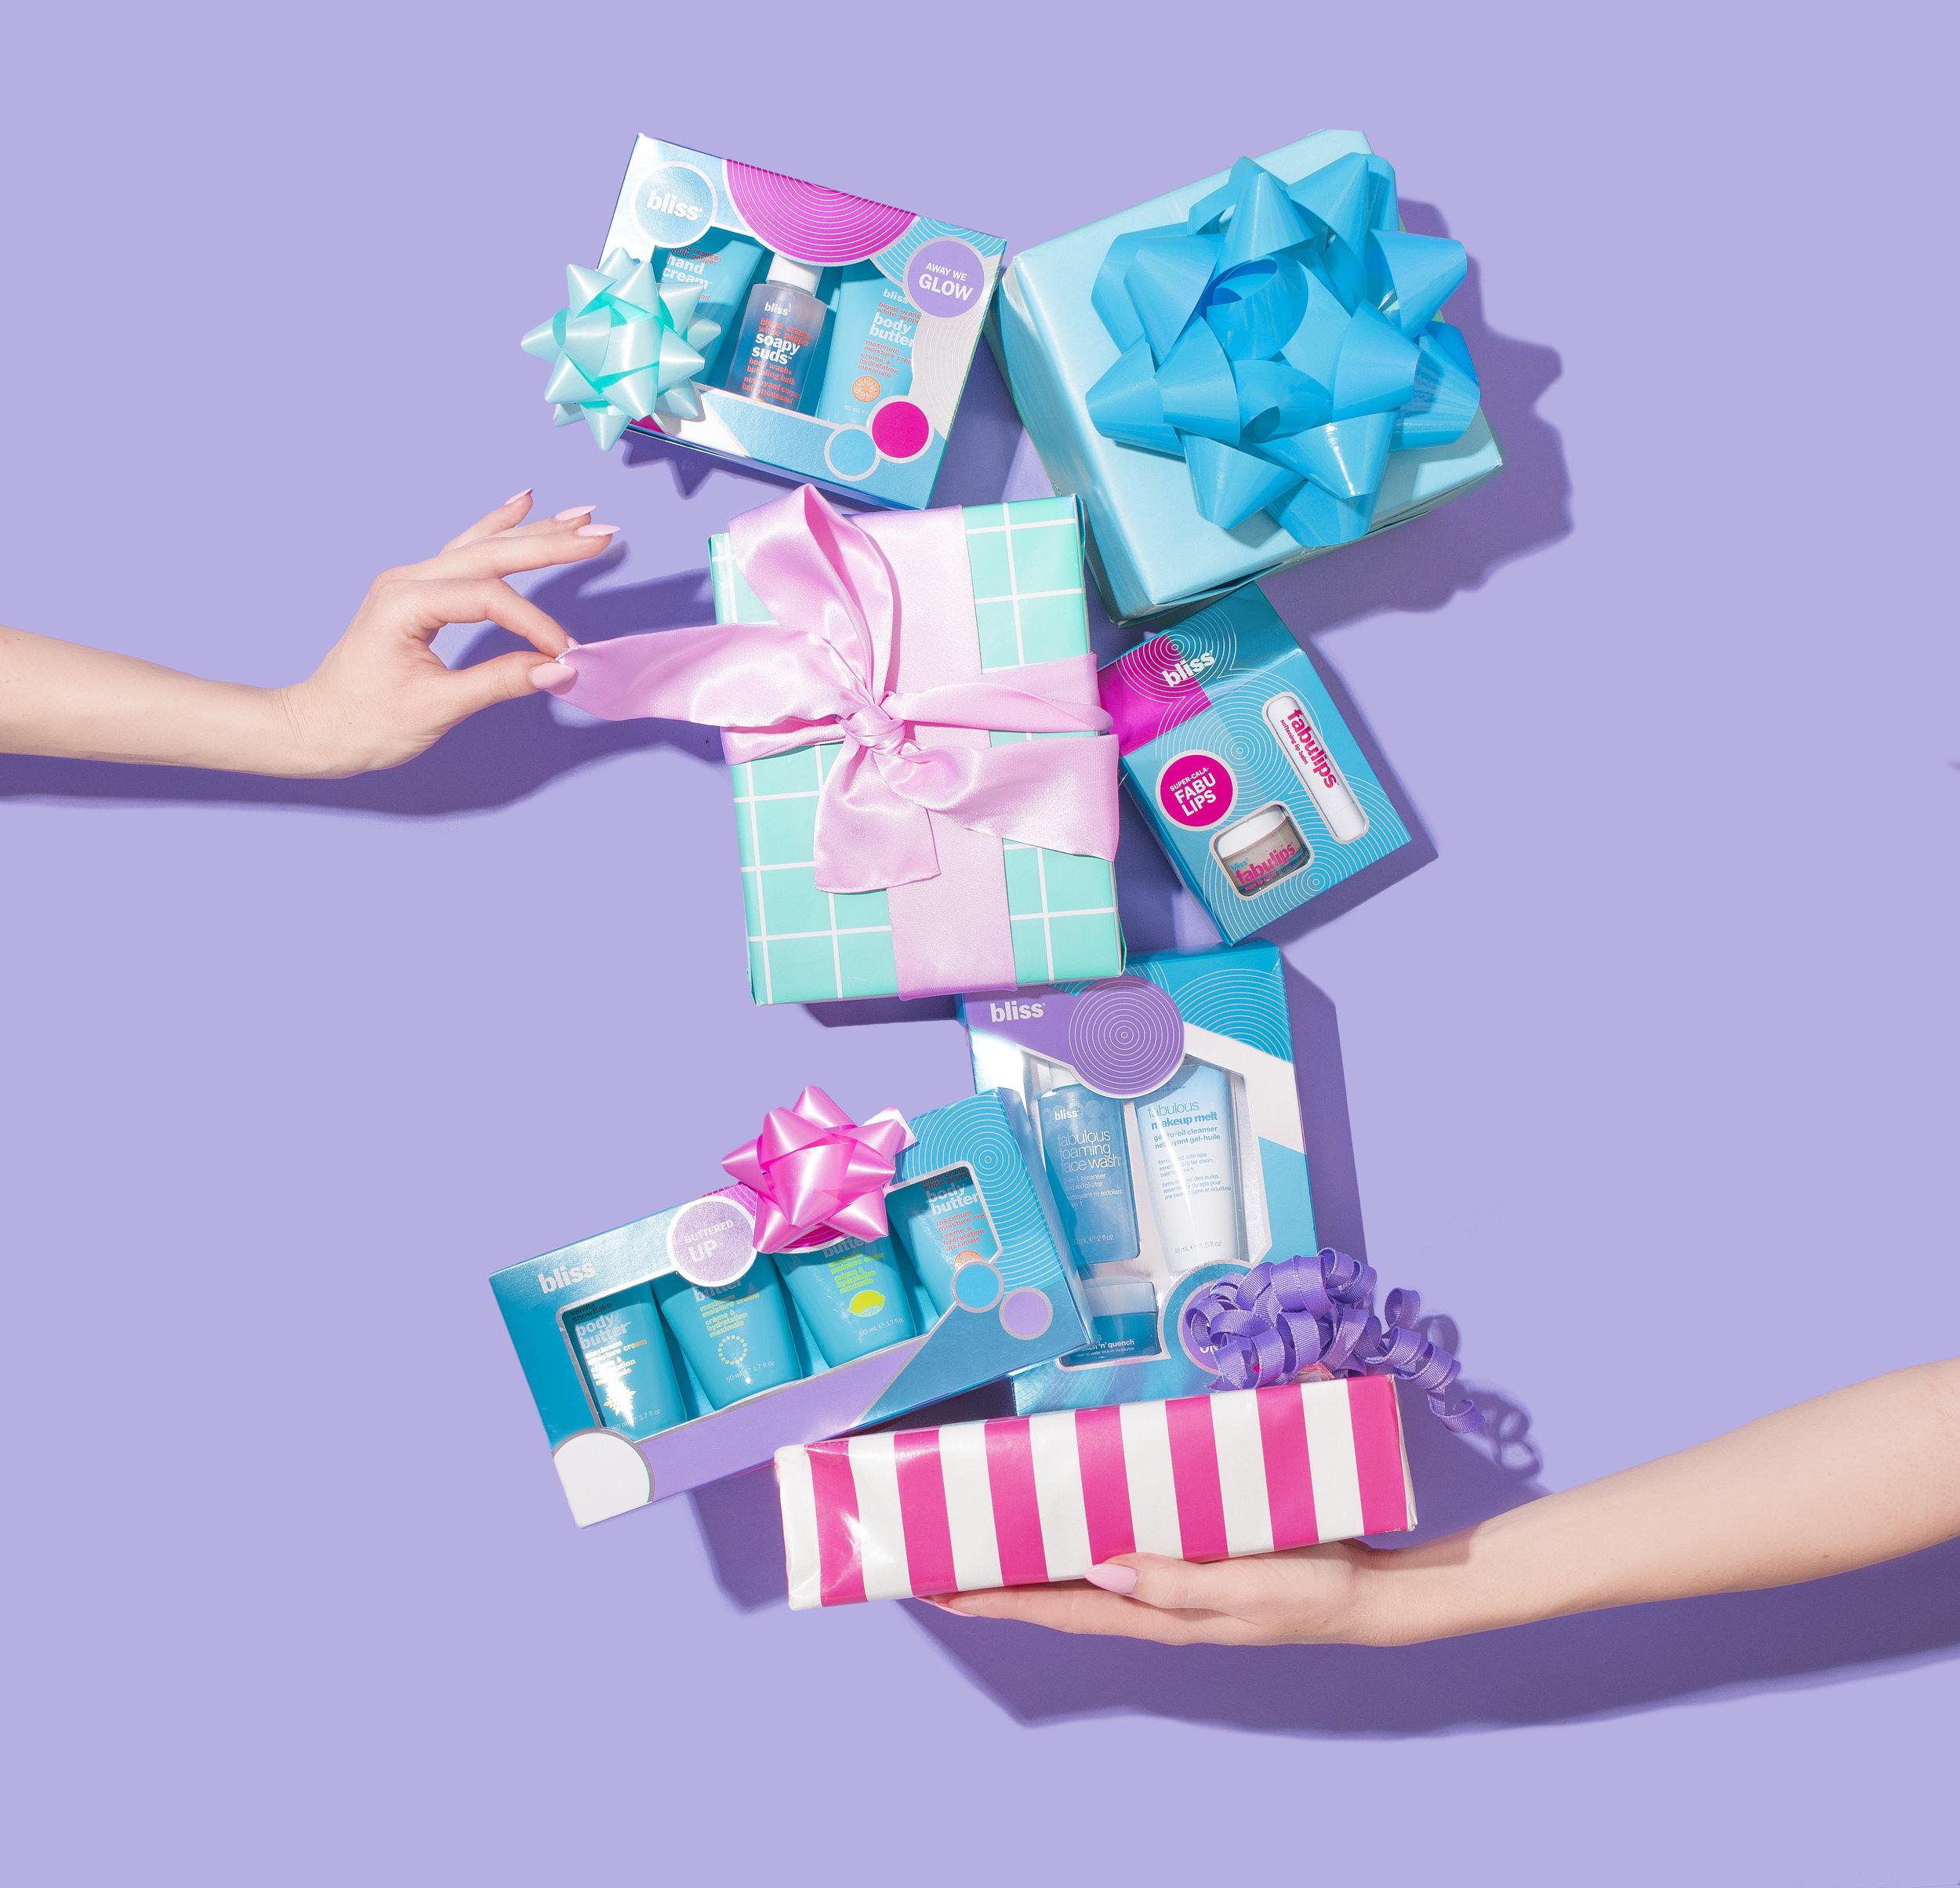 bliss-holiday-3-presents.jpg